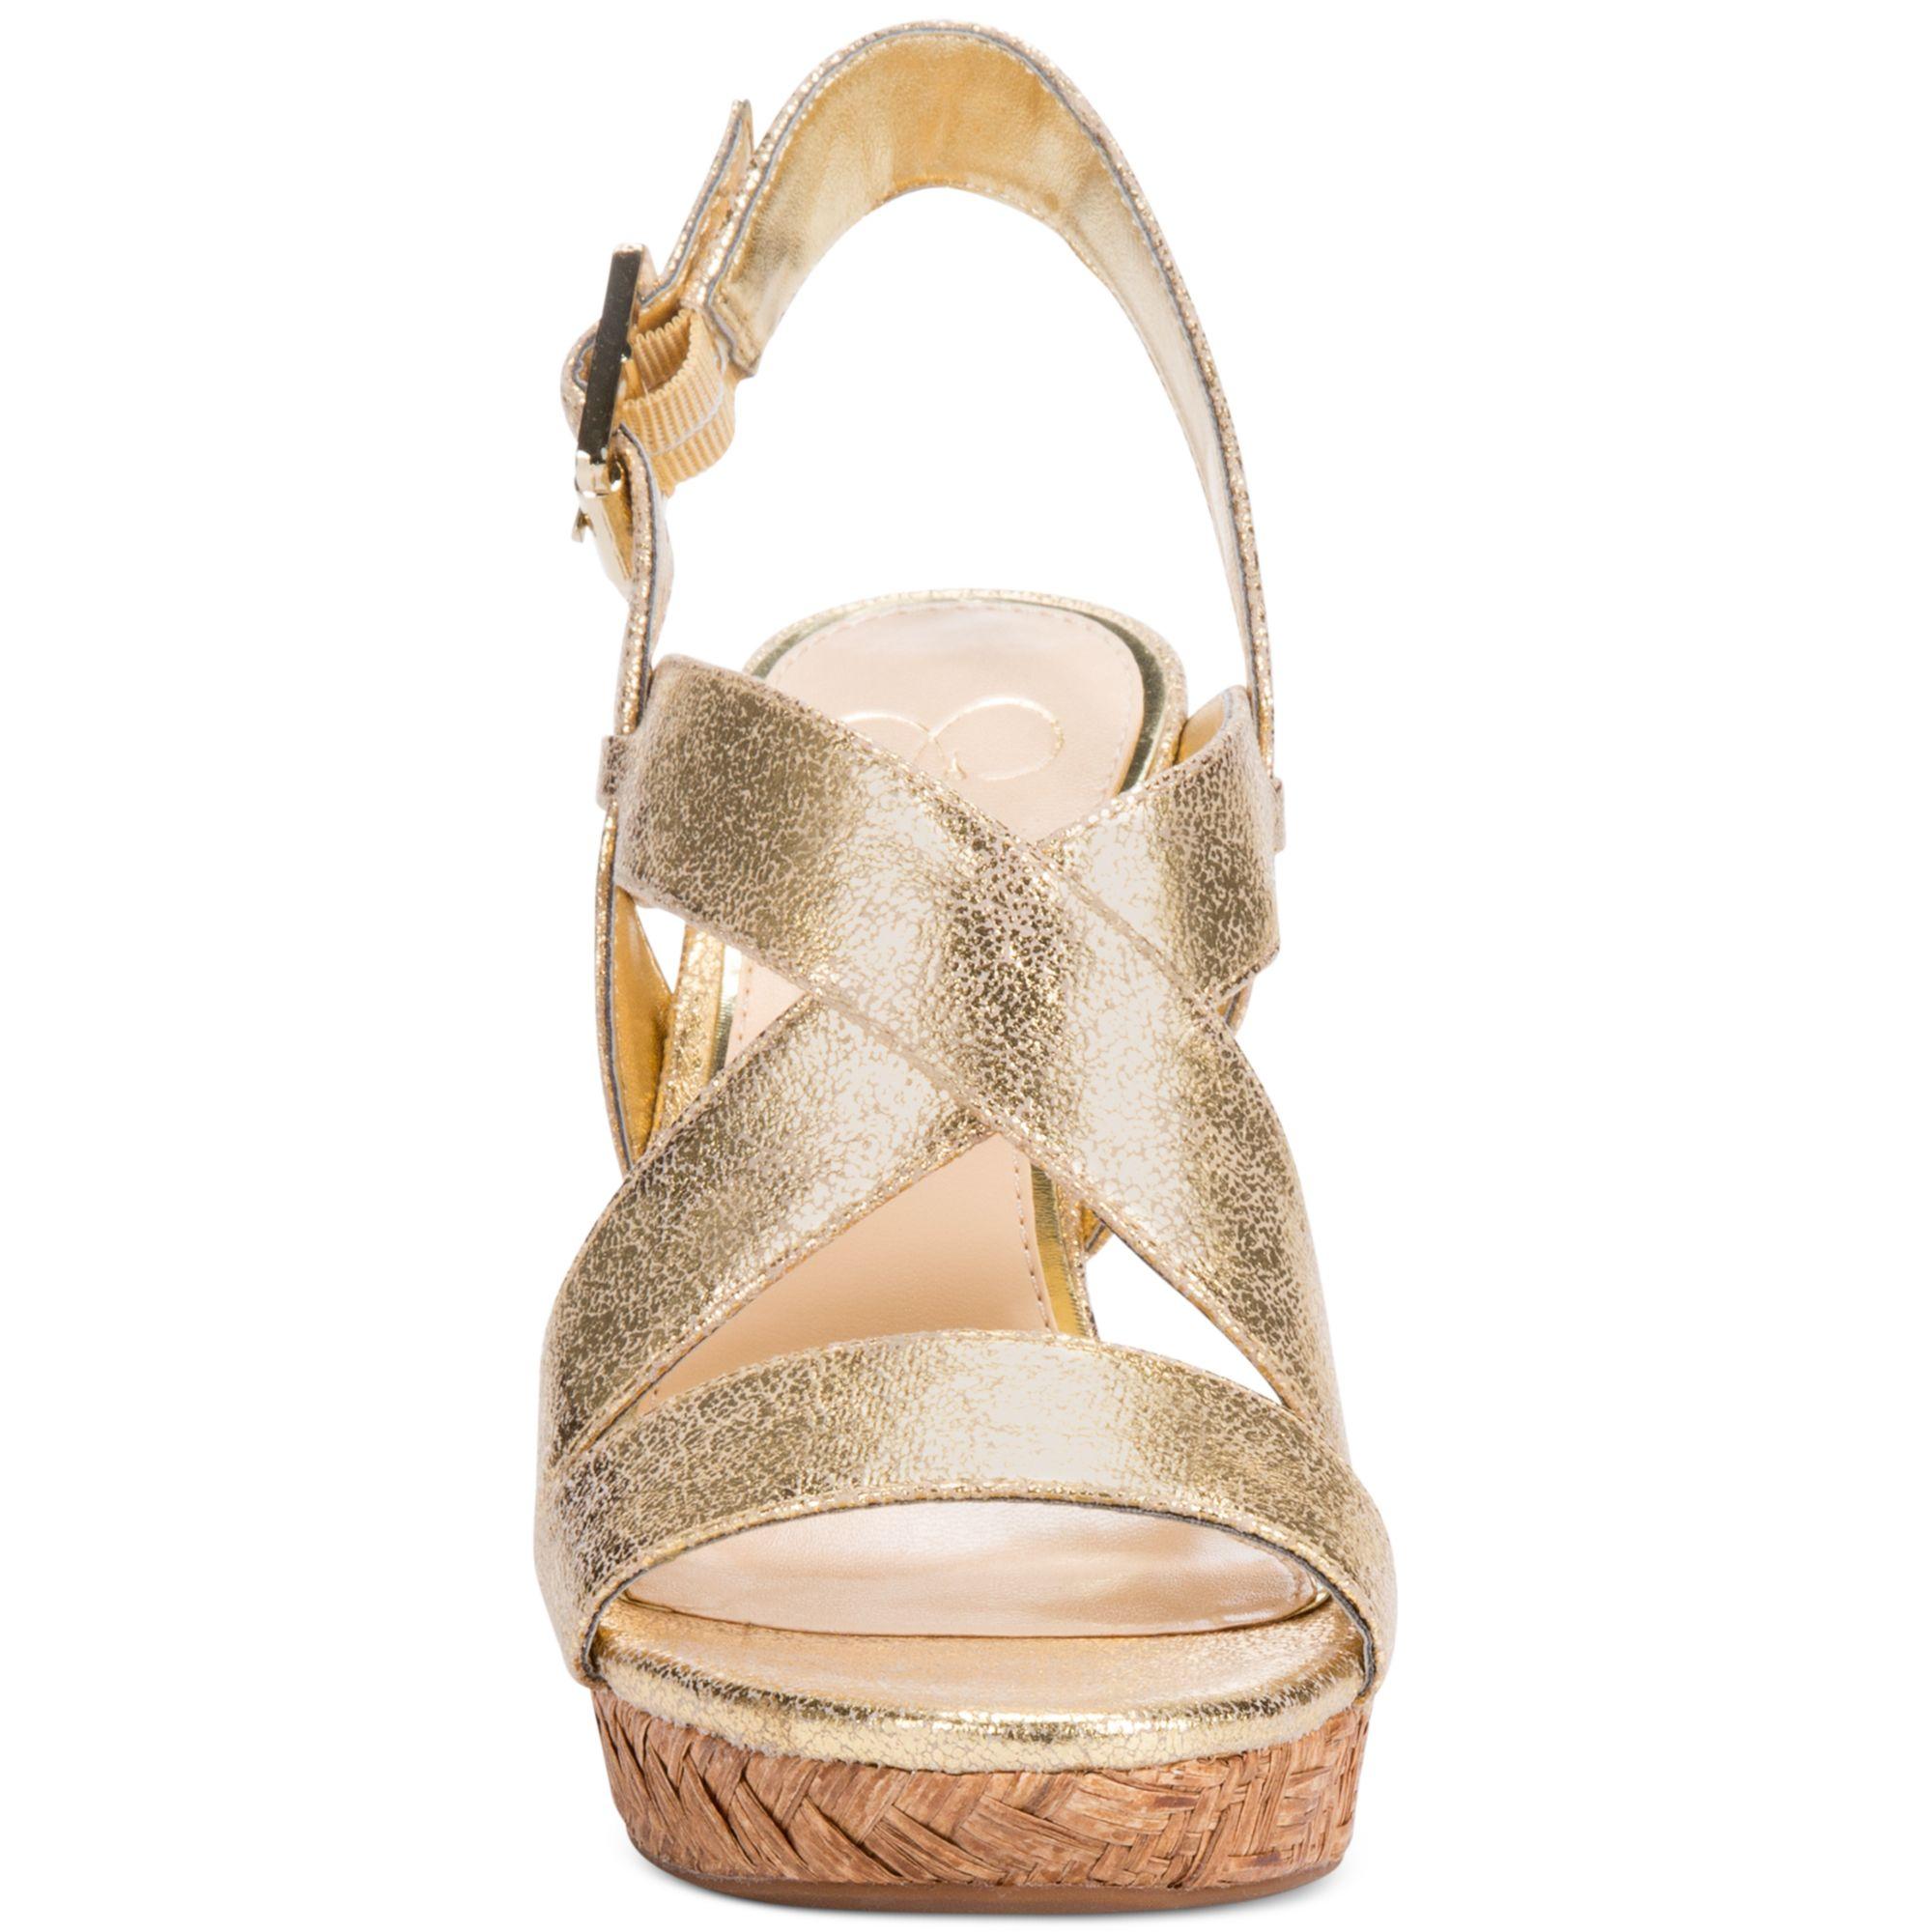 Lyst Jessica Simpson Jerrimo Platform Wedge Sandals In